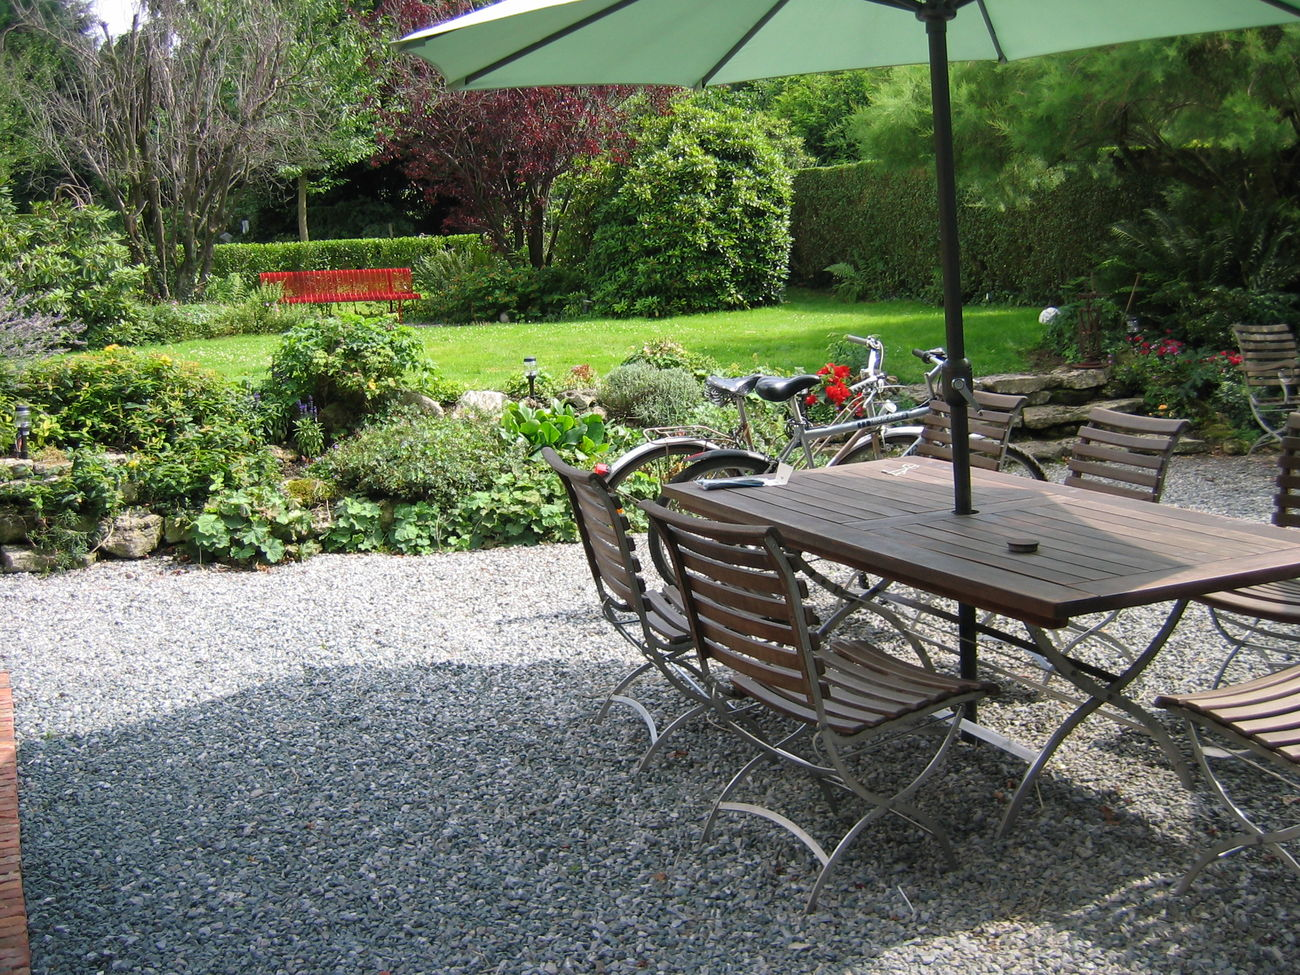 Alg tuinwerken frank willeghems wezembeek oppem t l for Entretien jardin 68